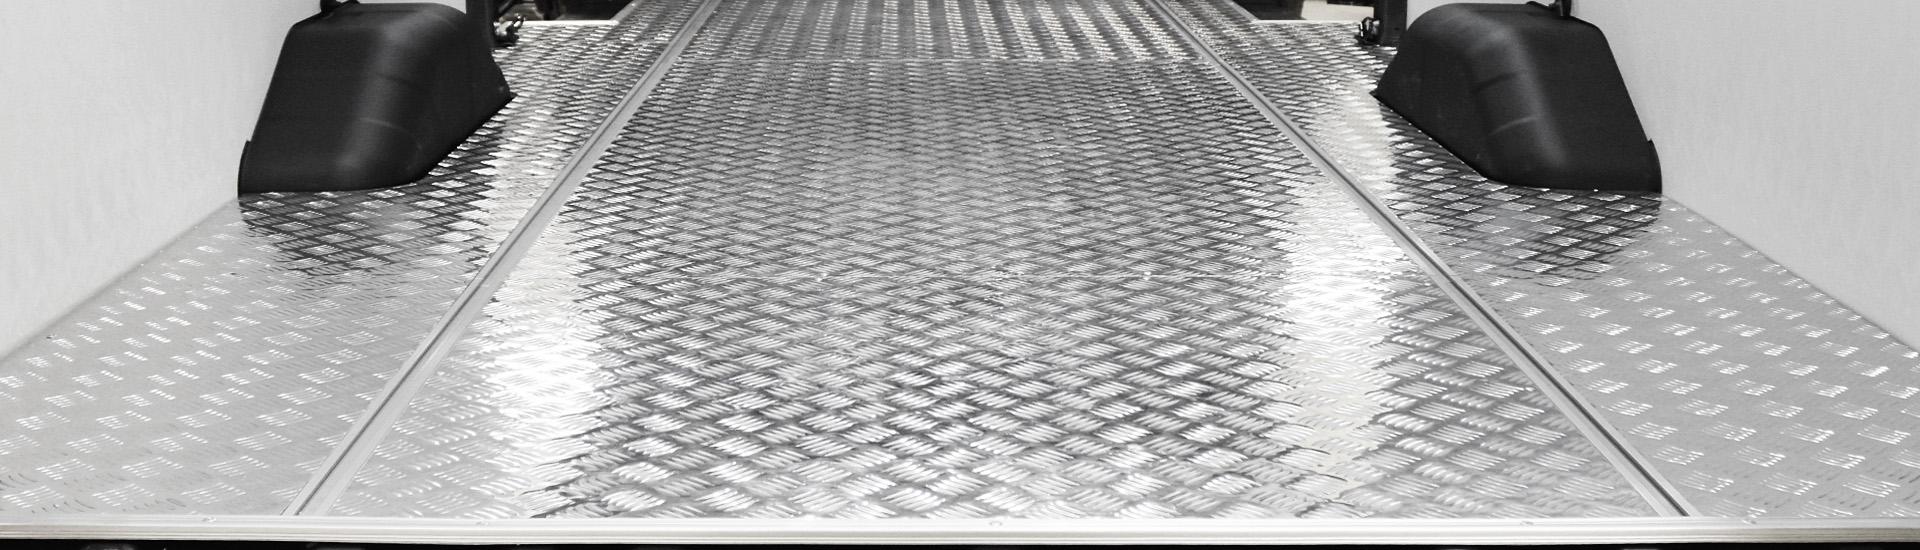 & Modul-Floor \u2013 Van Flooring \u0026 Liners | Modul-System